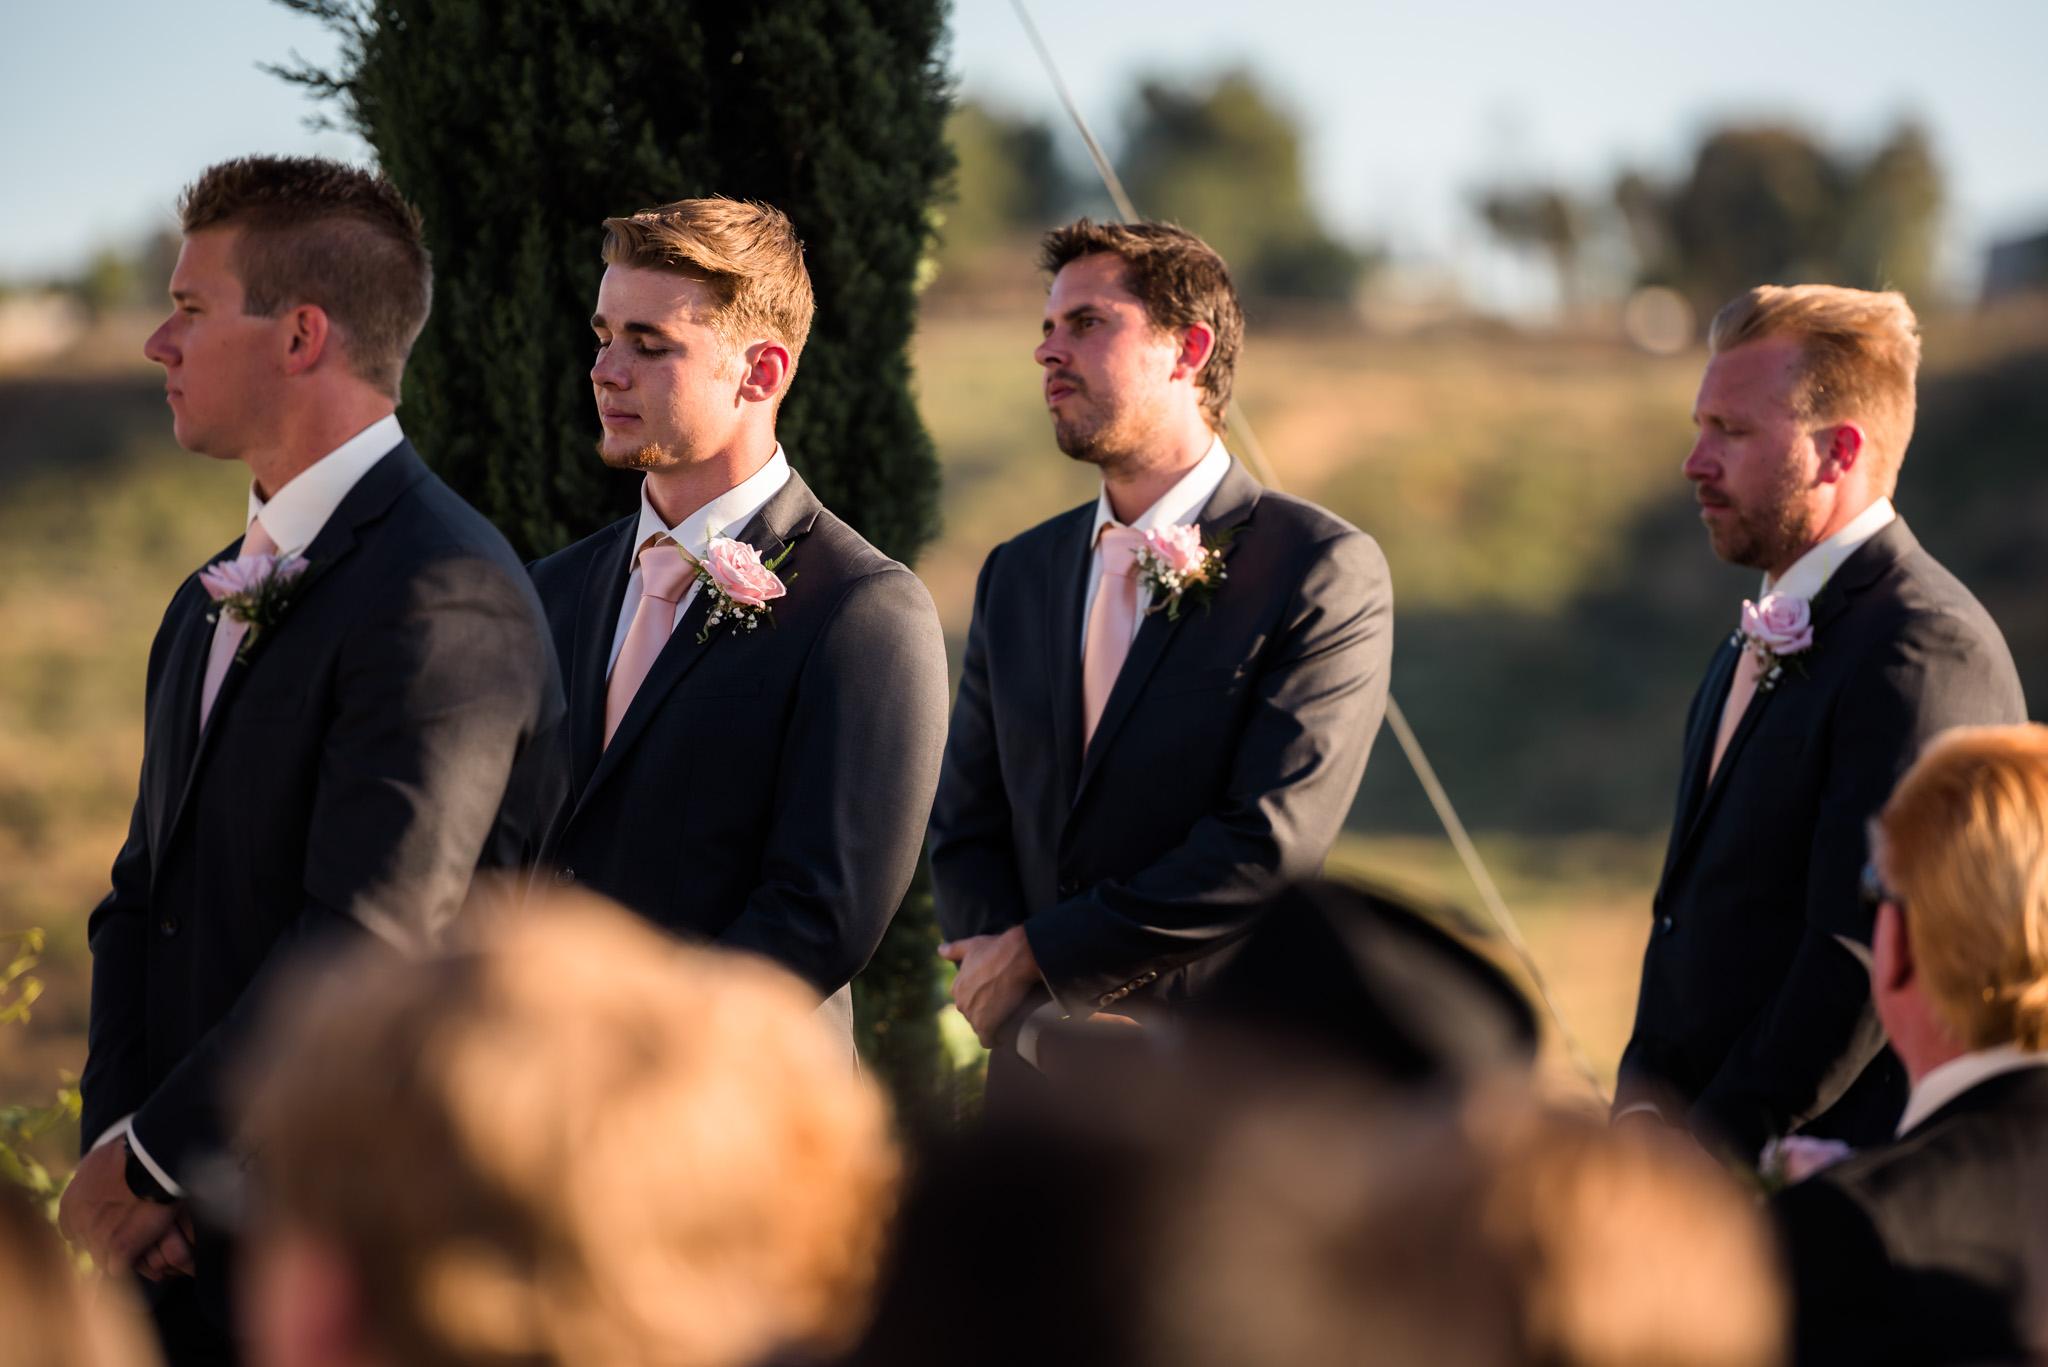 Avensole-Winery-Temecula-Wedding-Josh-and-Olivia-3525.JPG